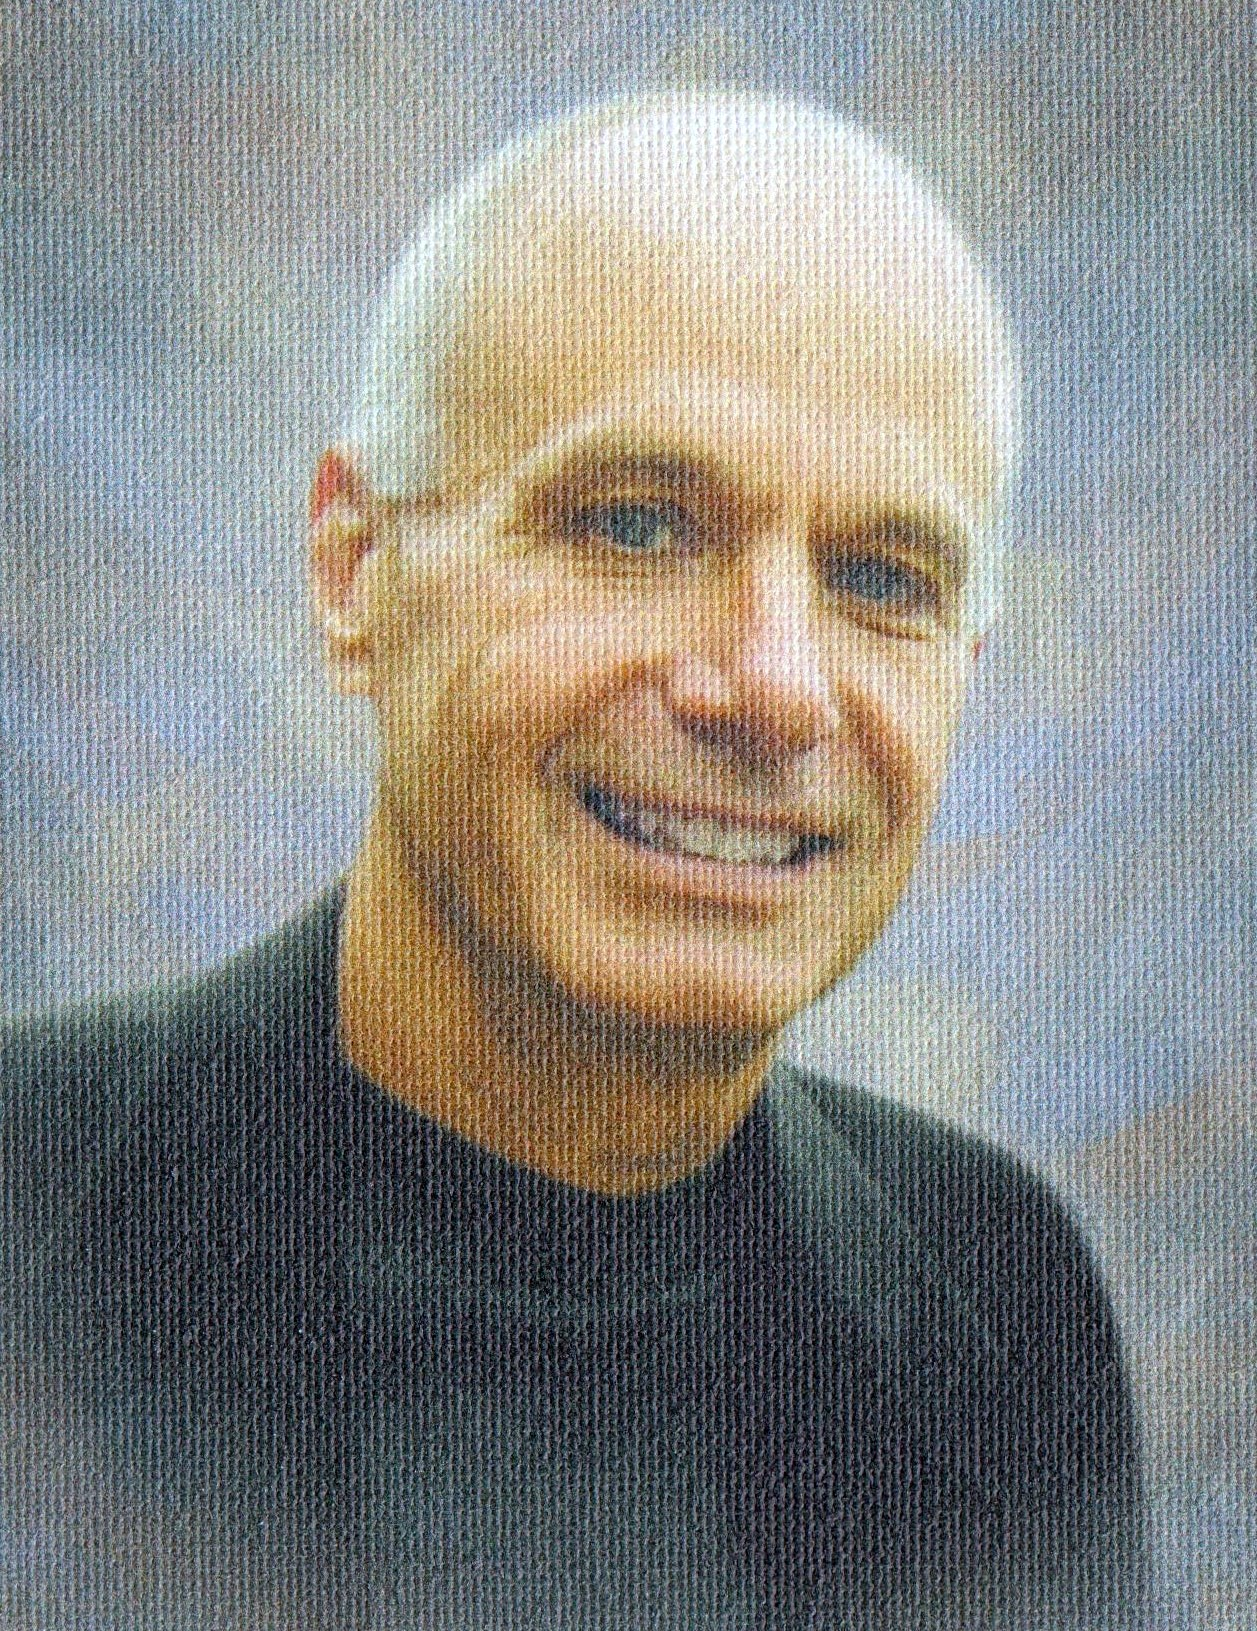 Orlin Martin  Sorensen Jr.